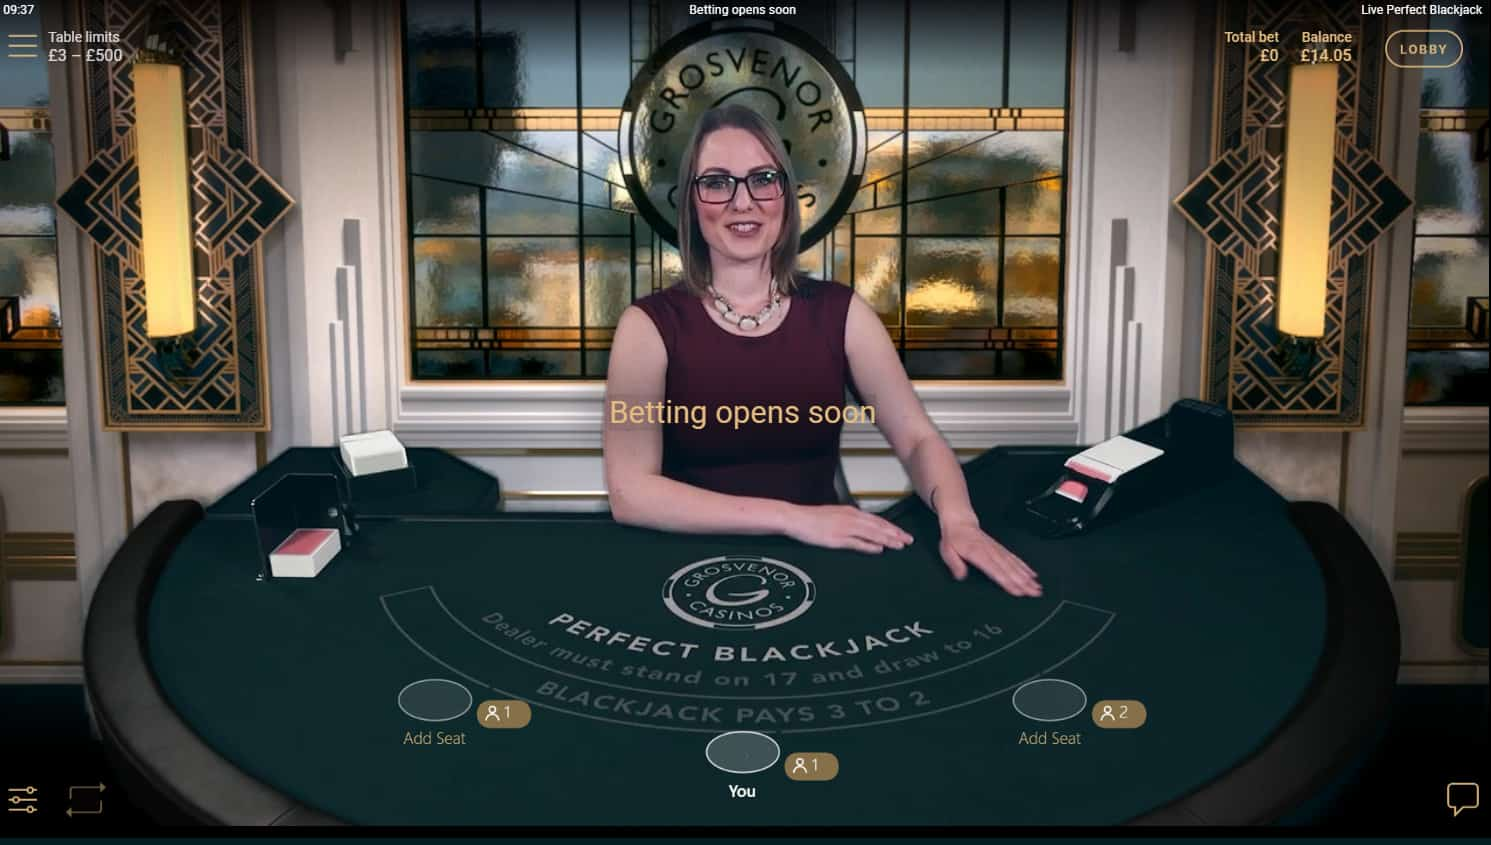 netent perfect blackjack dealer